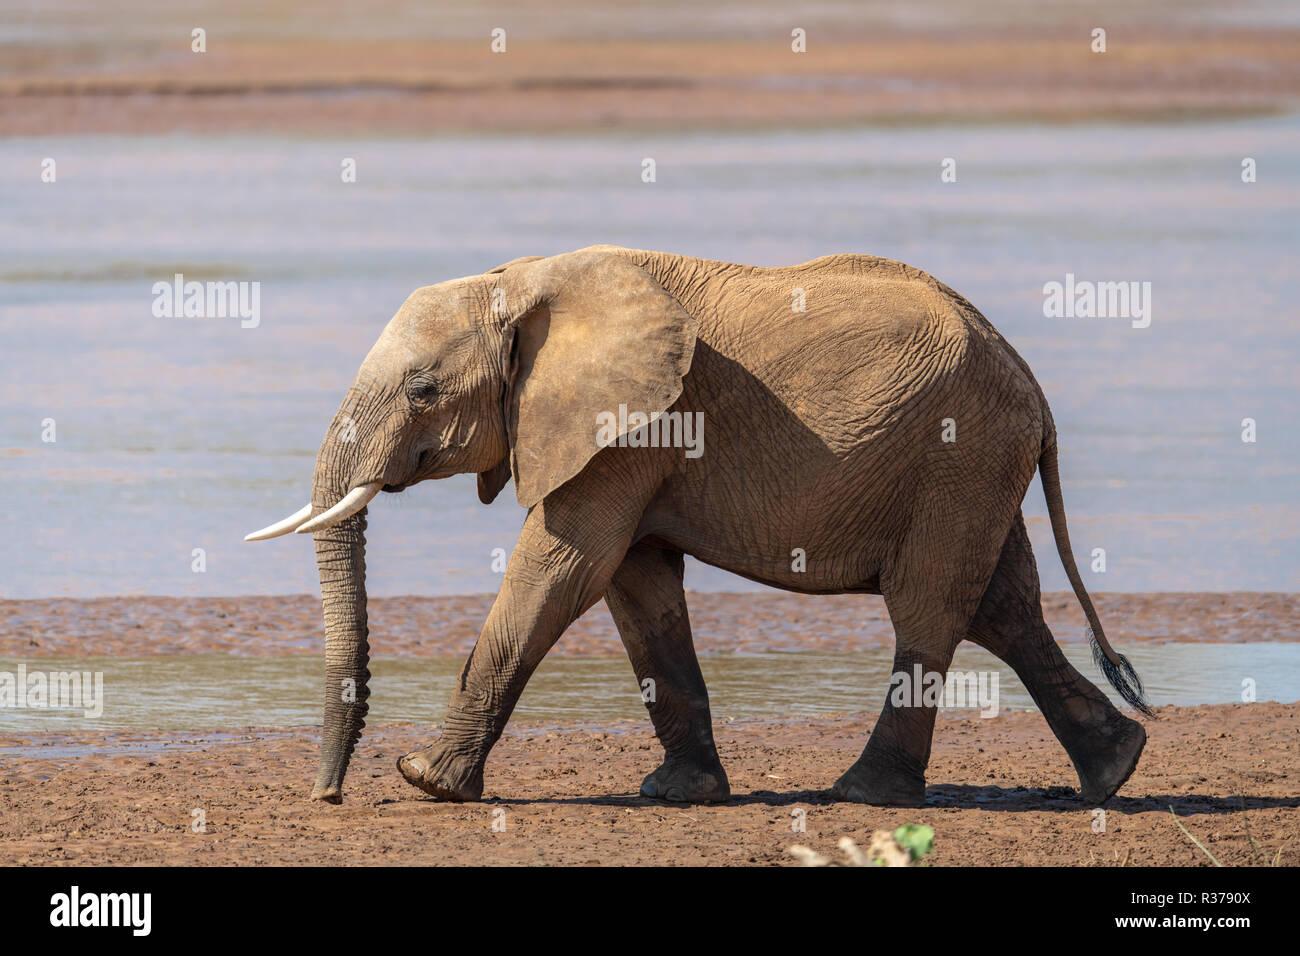 Baby African elephant (Loxodonta) in Kenya - Stock Image